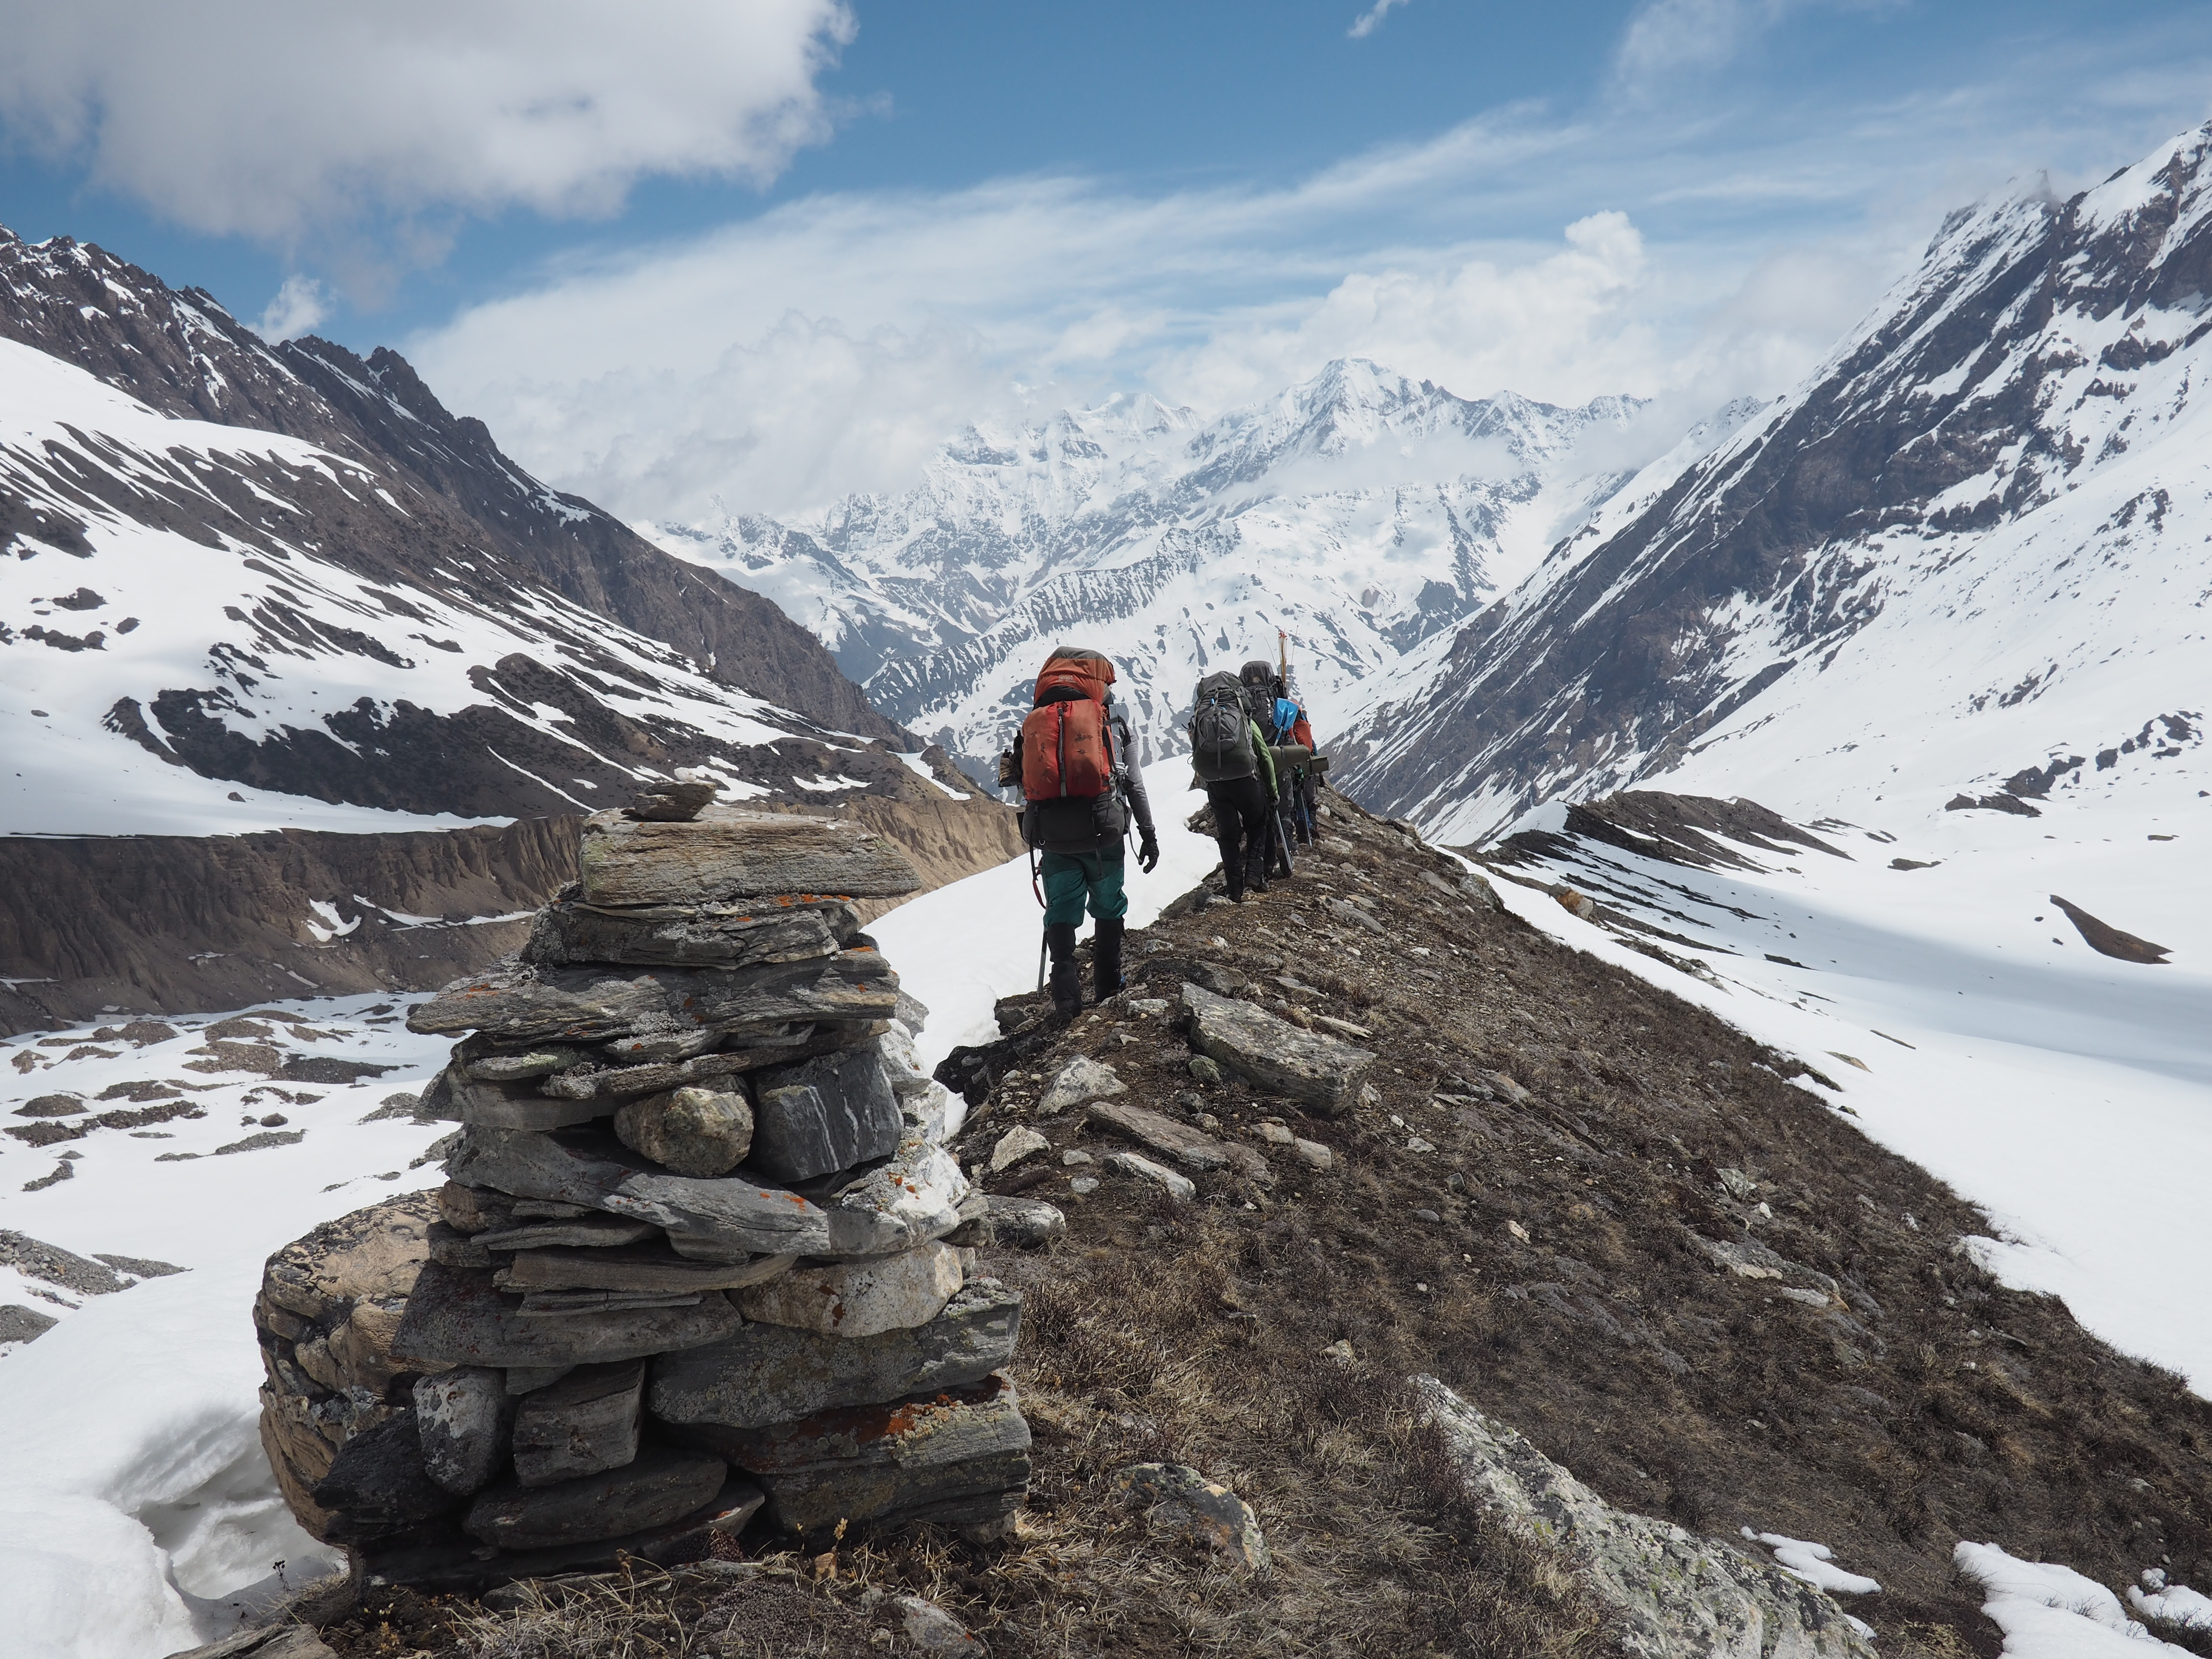 Gap Year Program - NOLS Himalaya Cultural Expedition  3